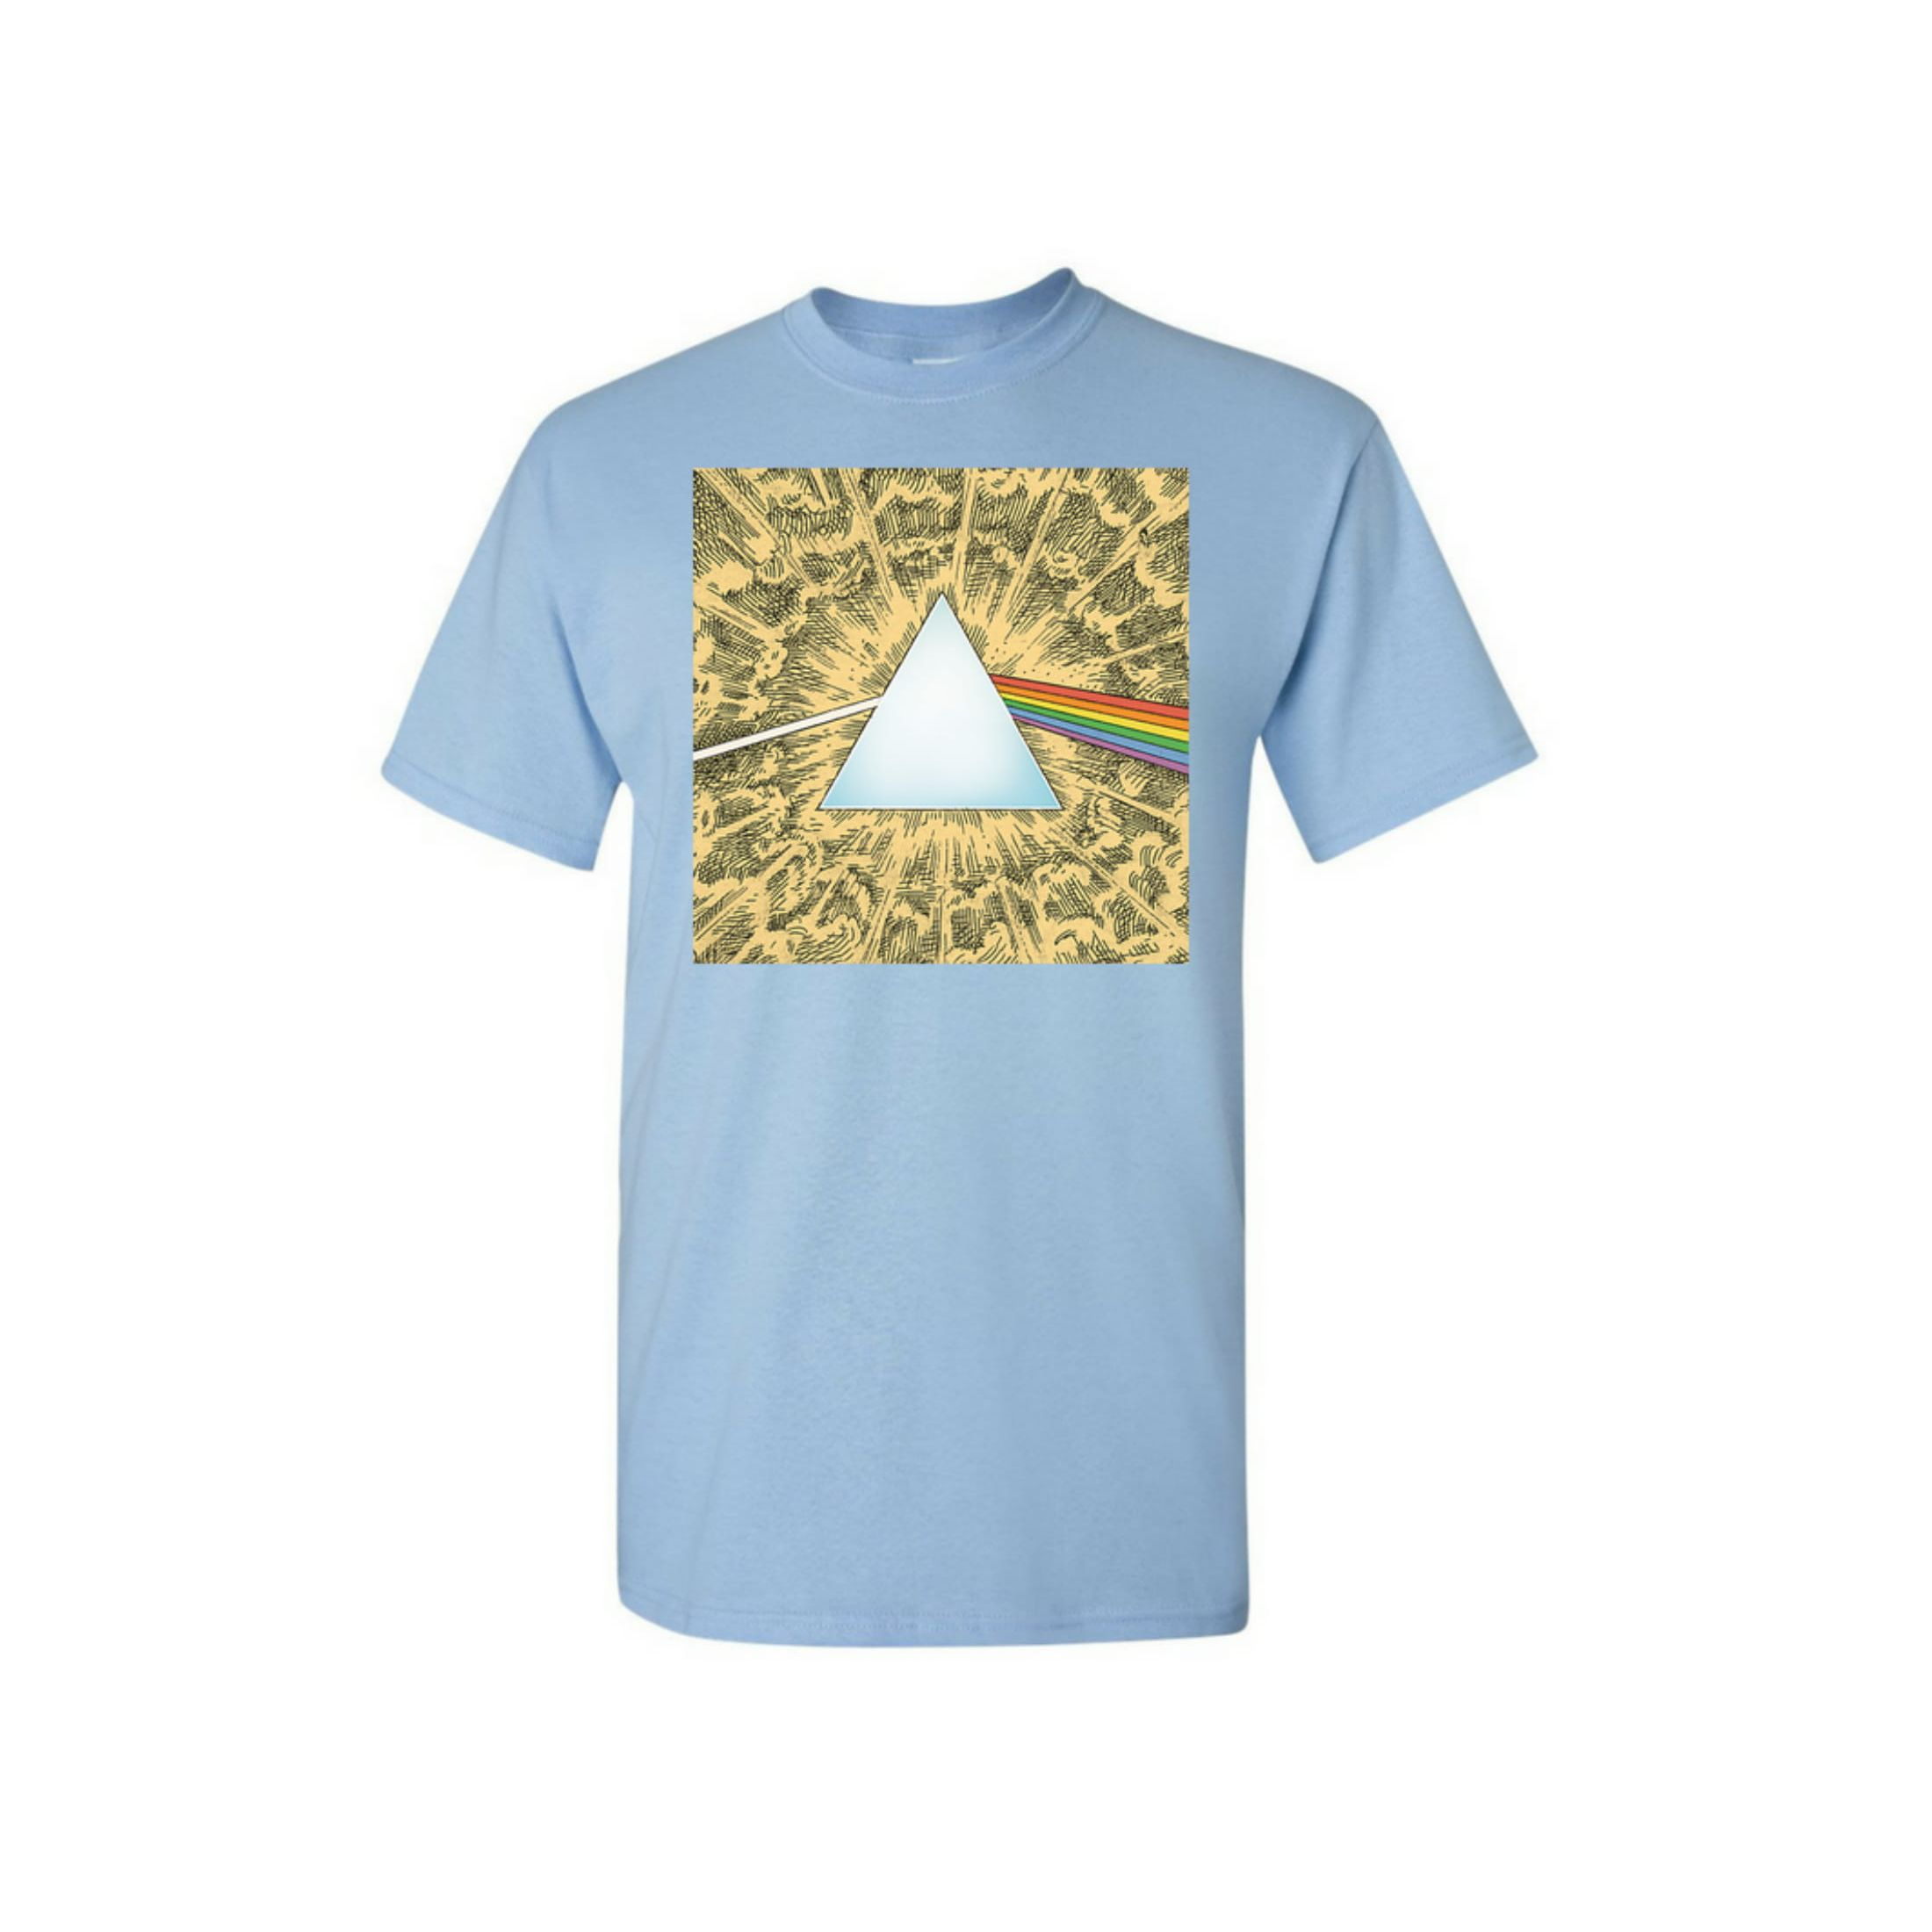 Prism Variations: Heavens T-Shirt